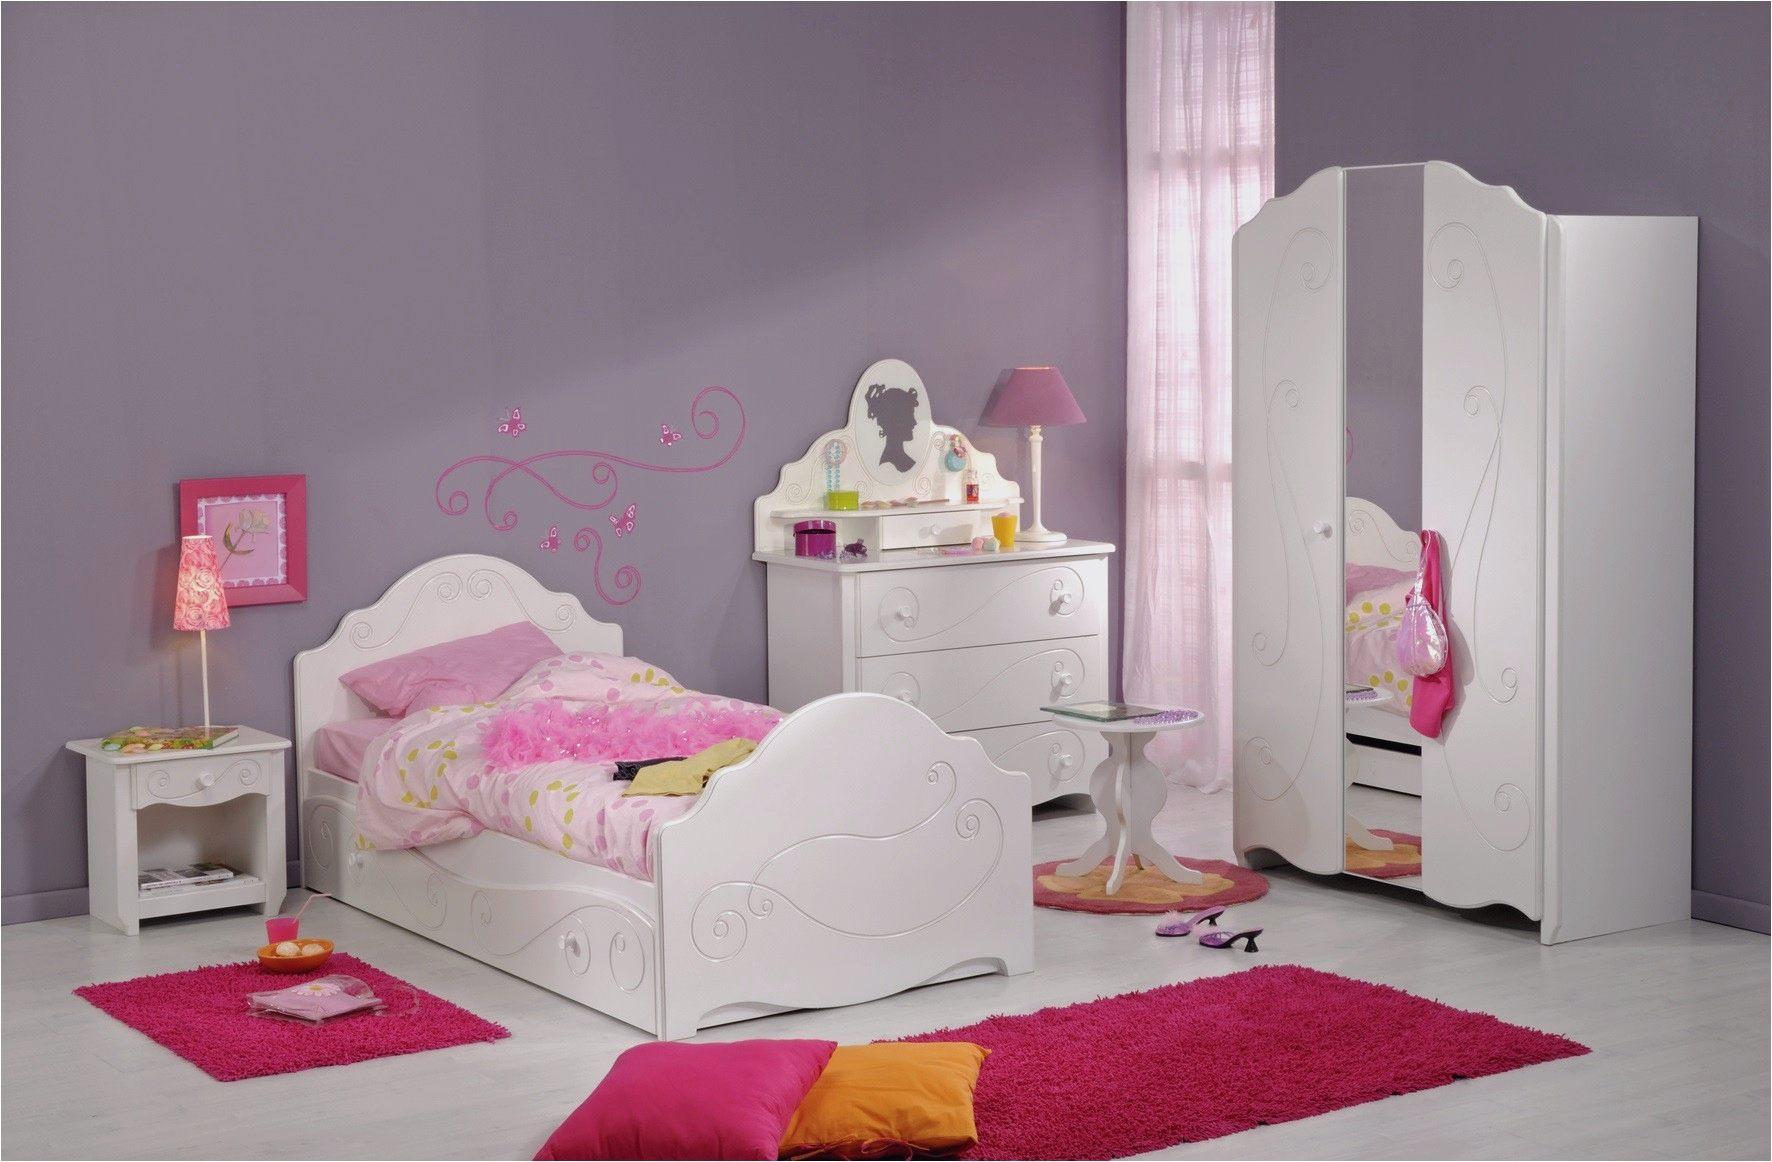 Lit toboggan Enfant Magnifique Lit Mezzanine toboggan Génial Ahuri Lit toboggan Ikea Design D